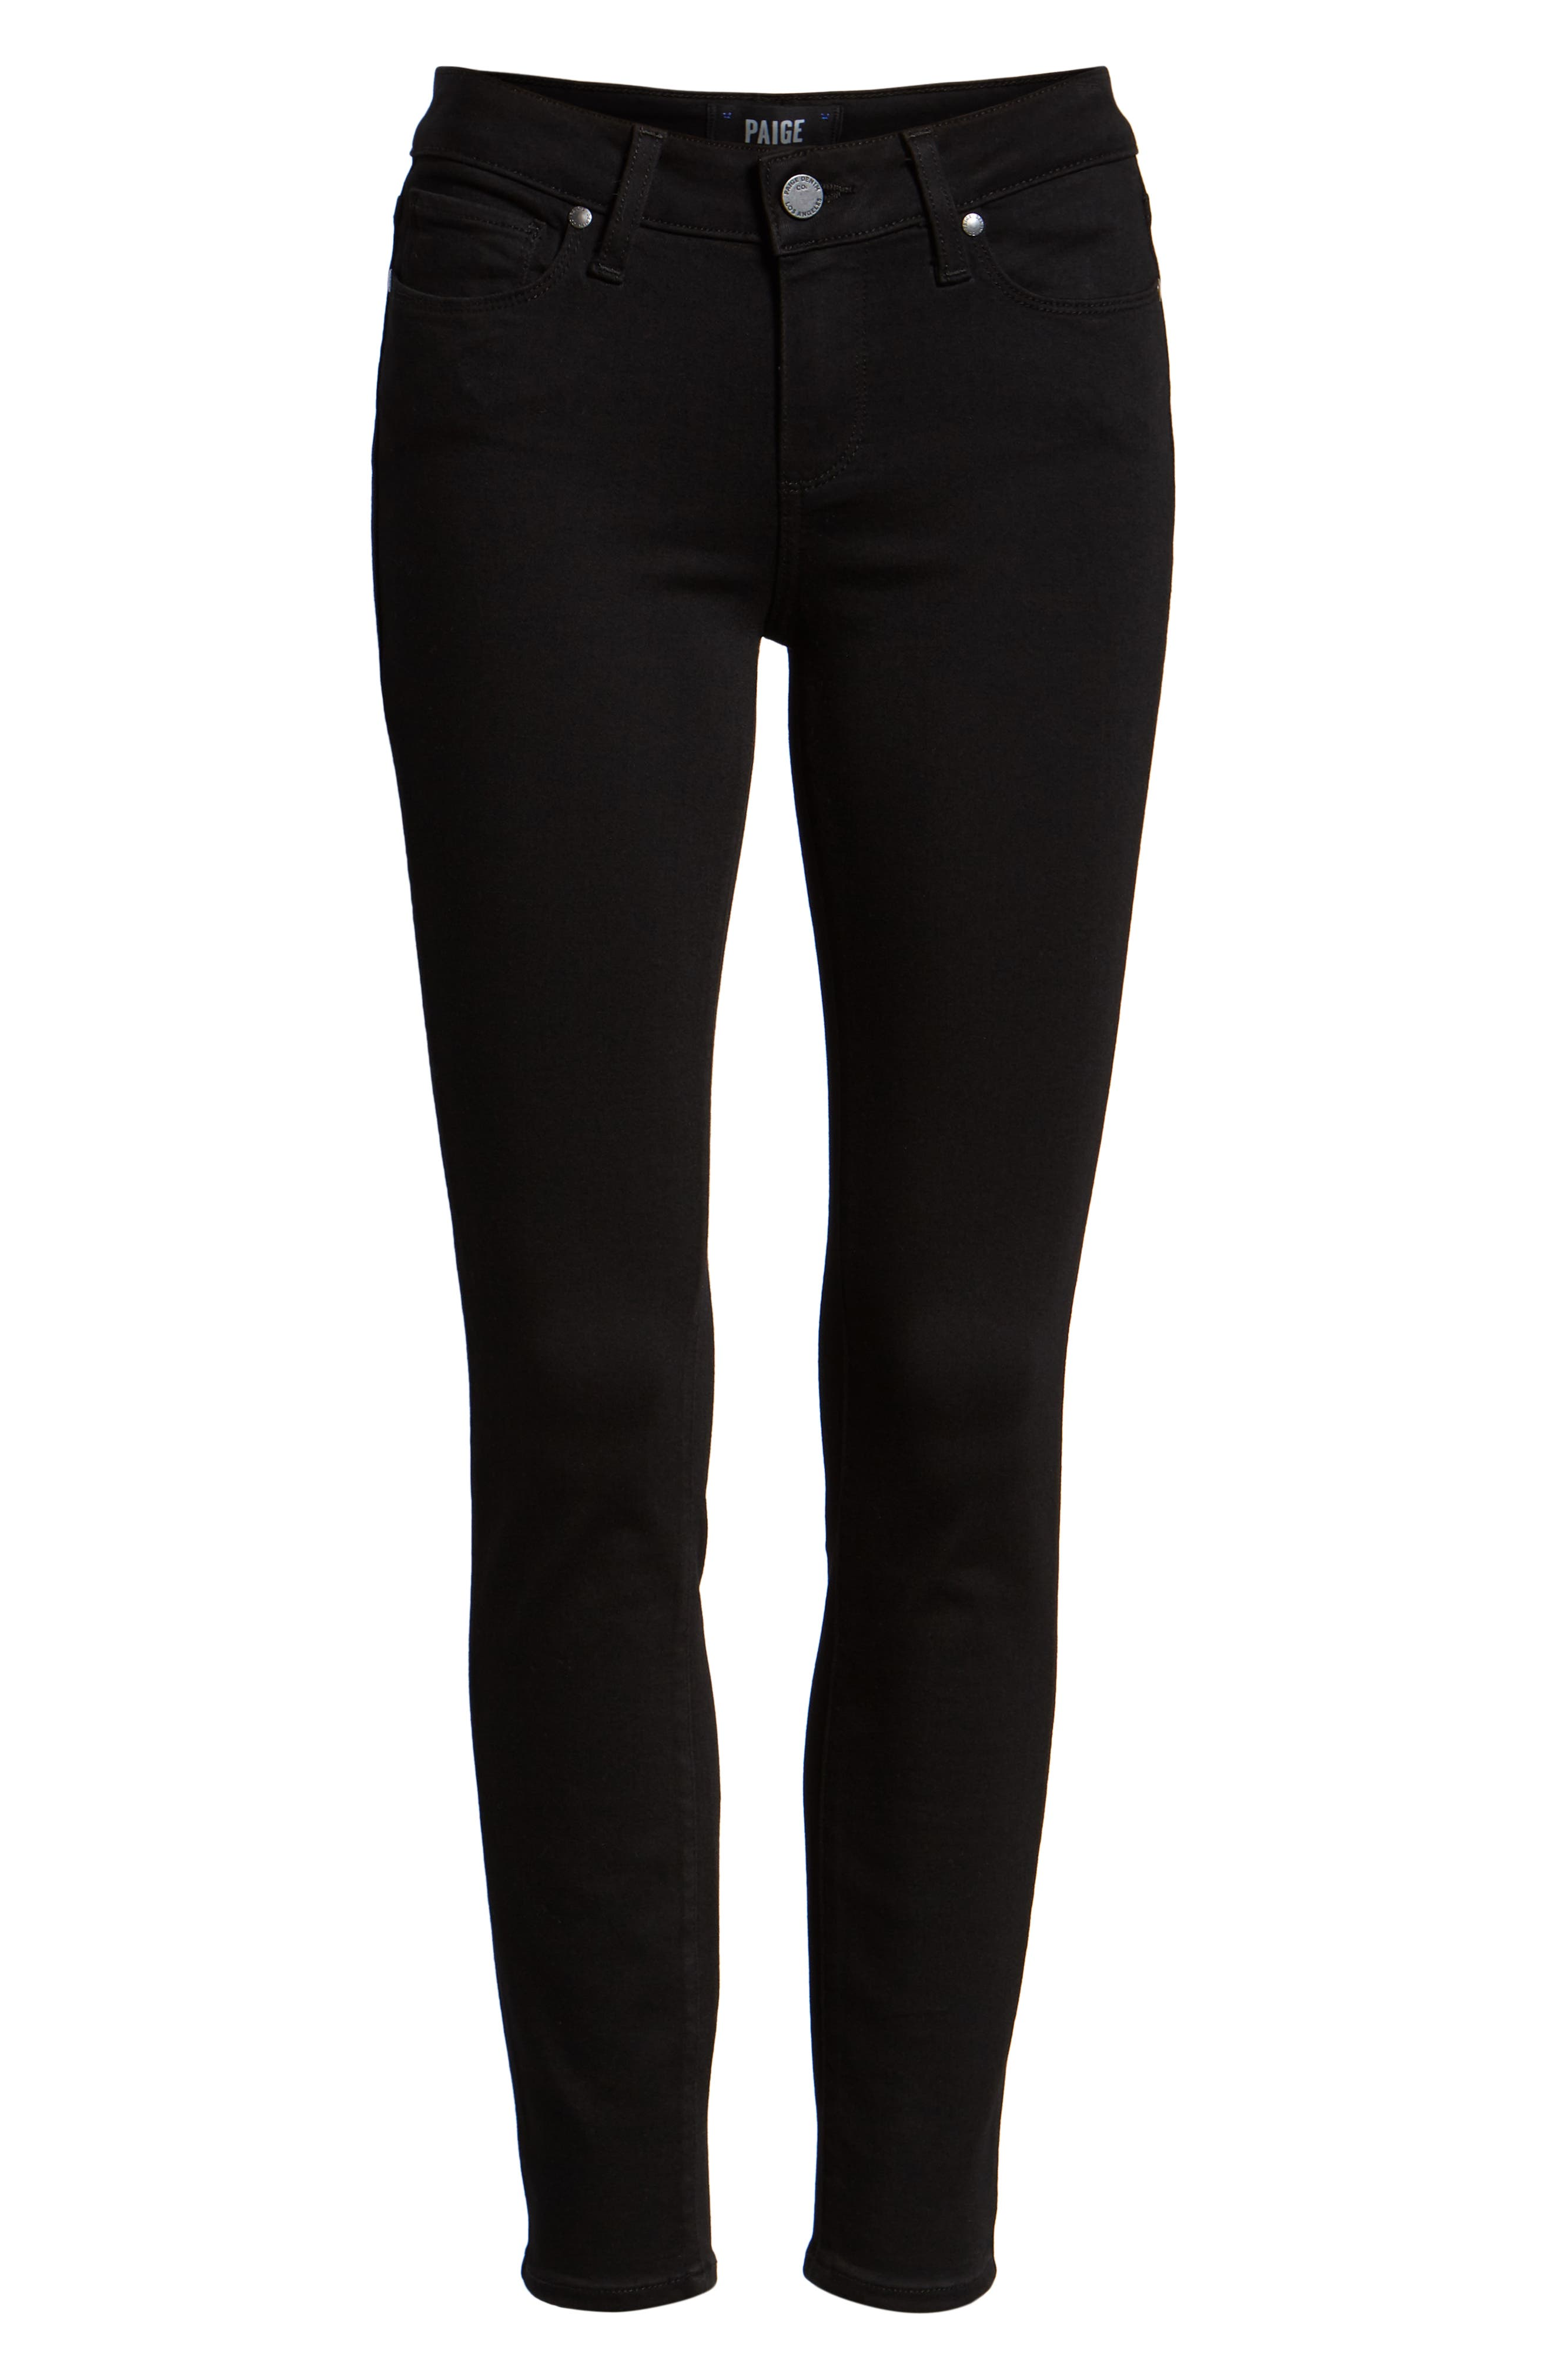 Transcend - Verdugo Ankle Ultra Skinny Jeans,                             Alternate thumbnail 8, color,                             BLACK SHADOW